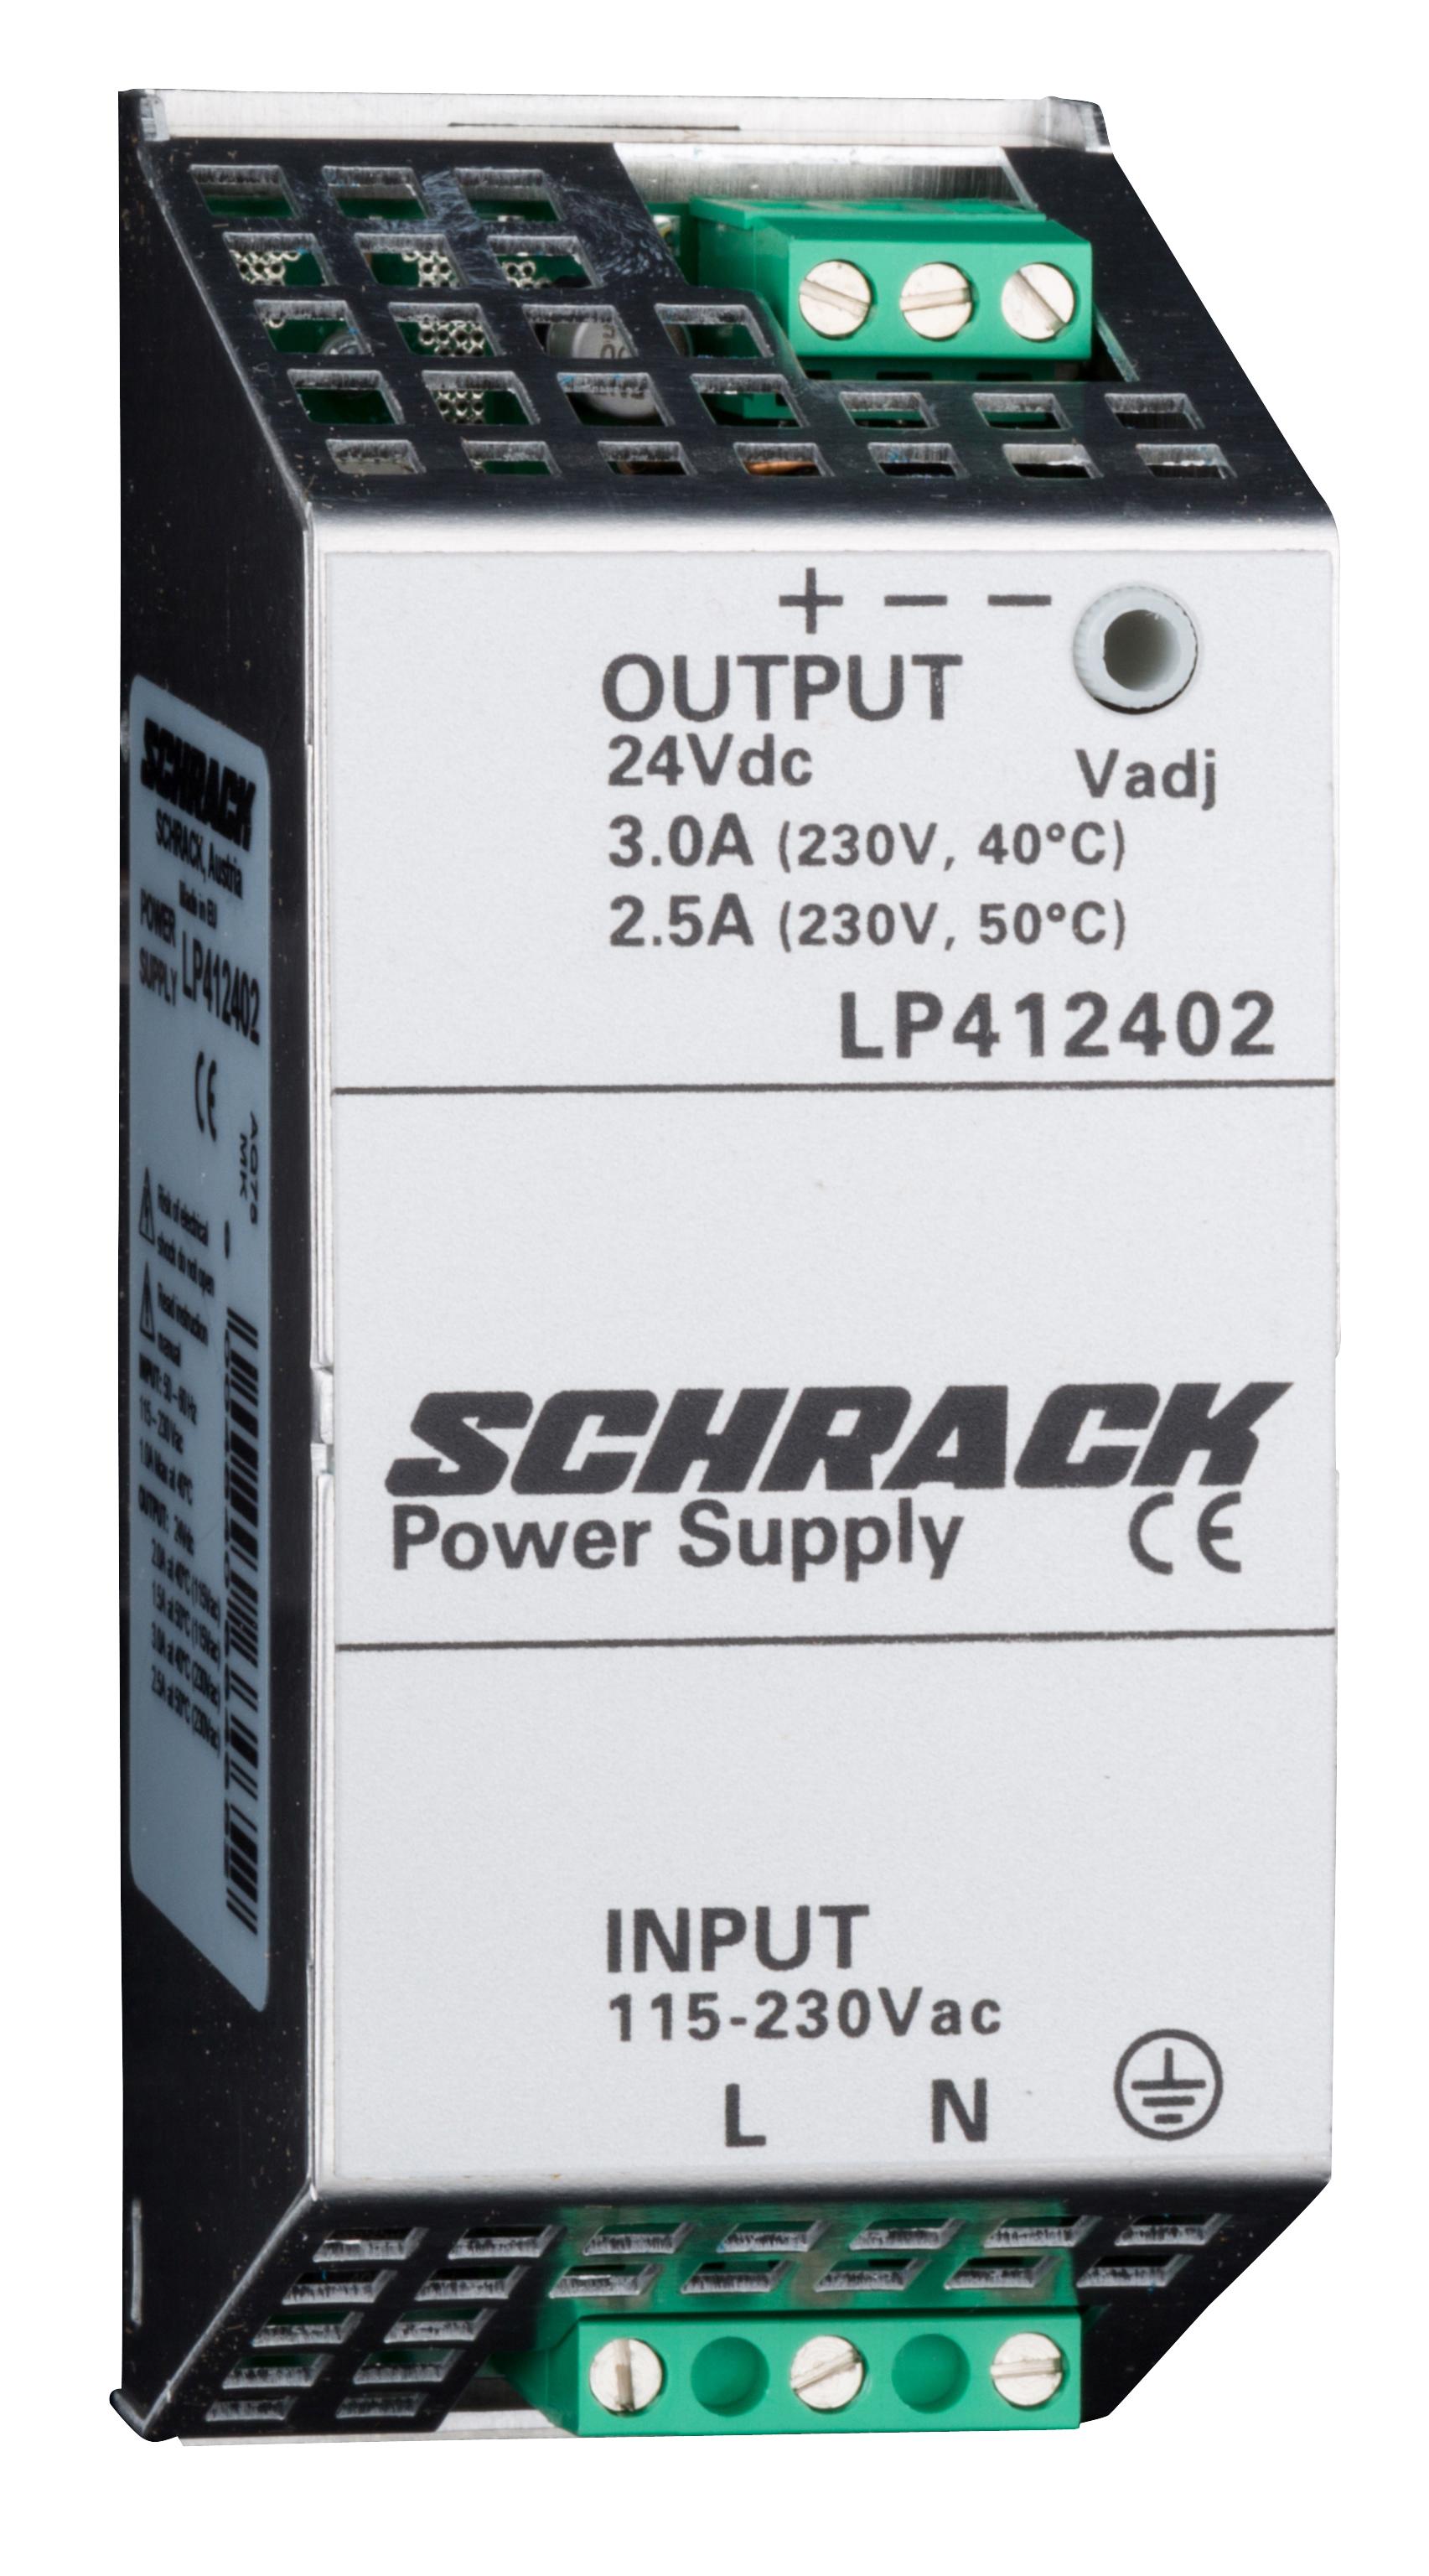 1 Stk Einphasiges Netzgerät getaktet, 230VAC/24VDC, 2,5A bei 50°C LP412402--